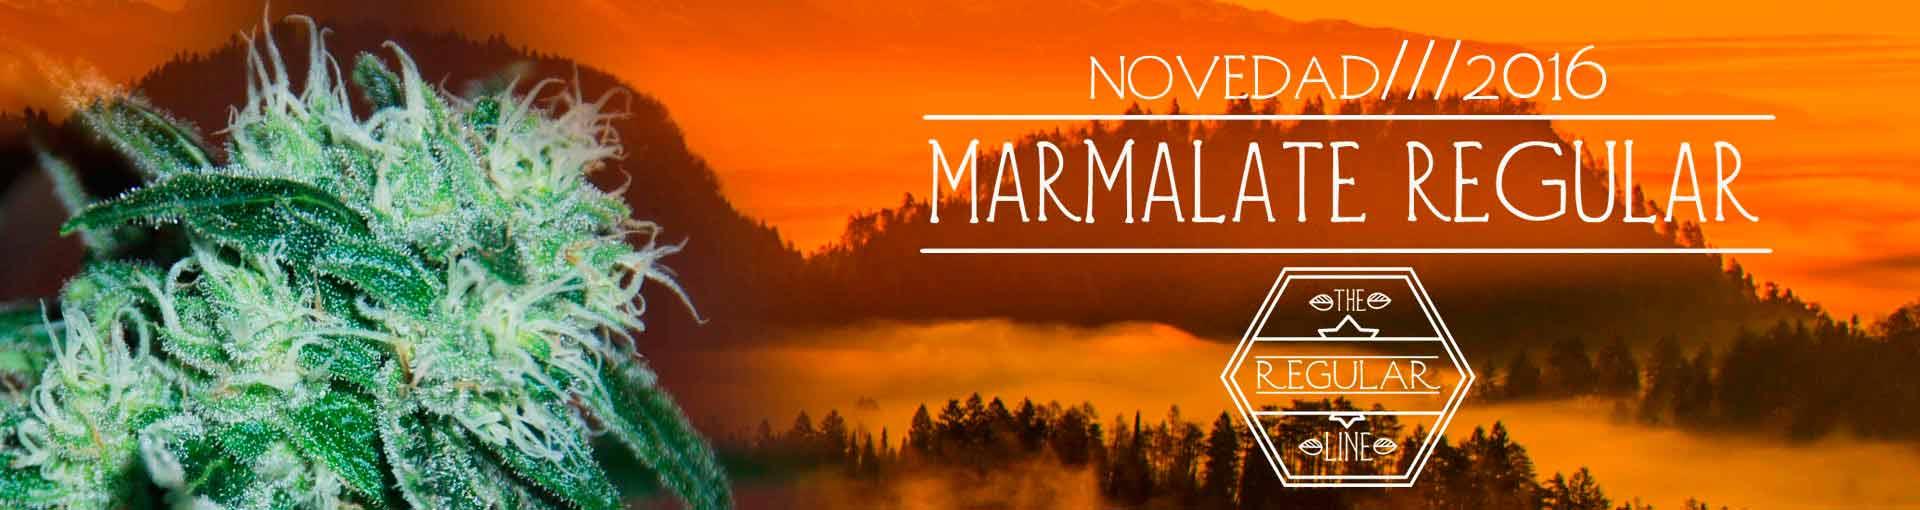 Marmalate Regular